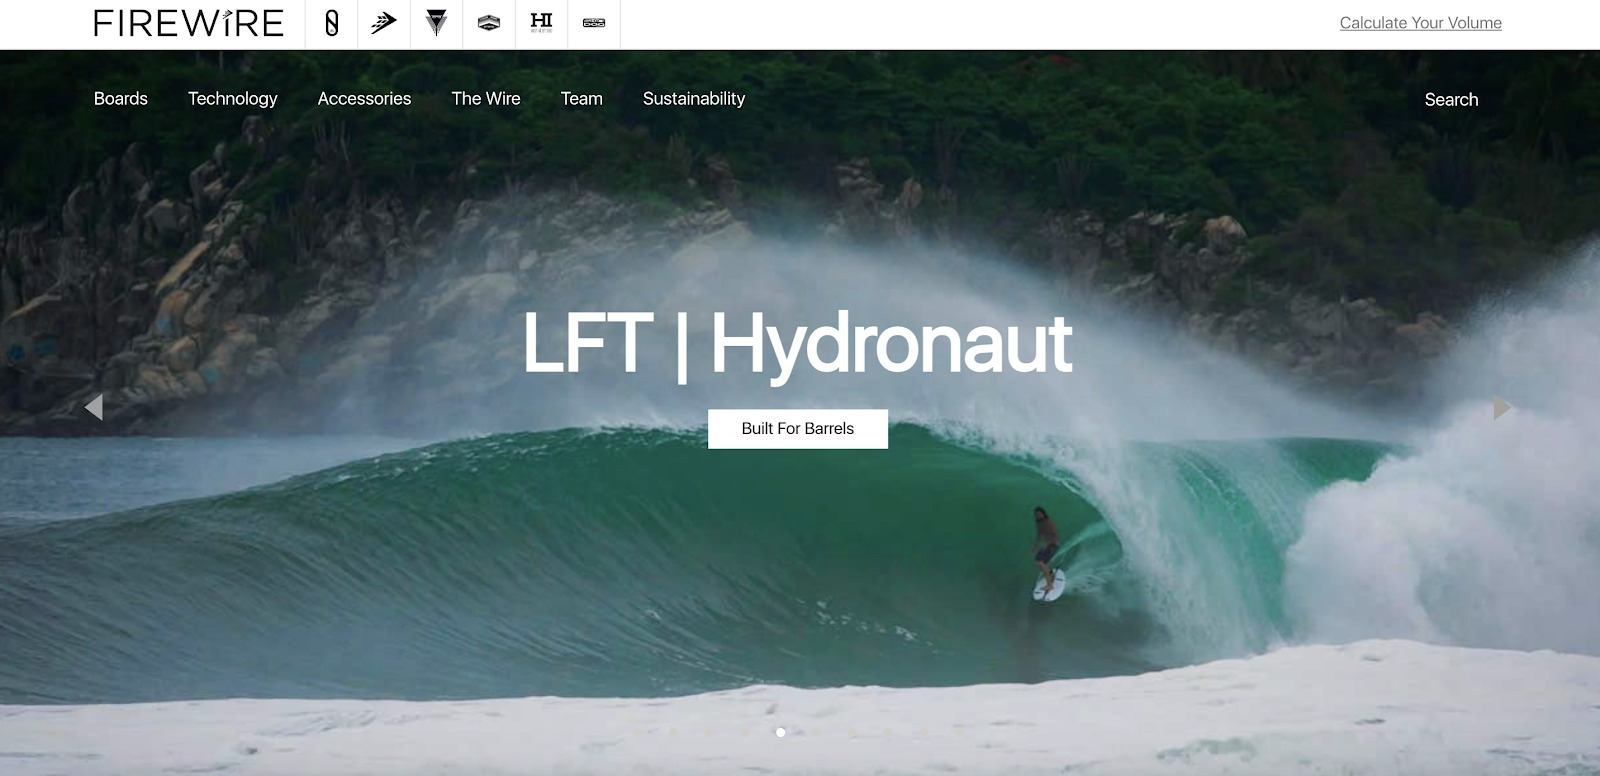 esempio di homepage di tavole da surf firewire